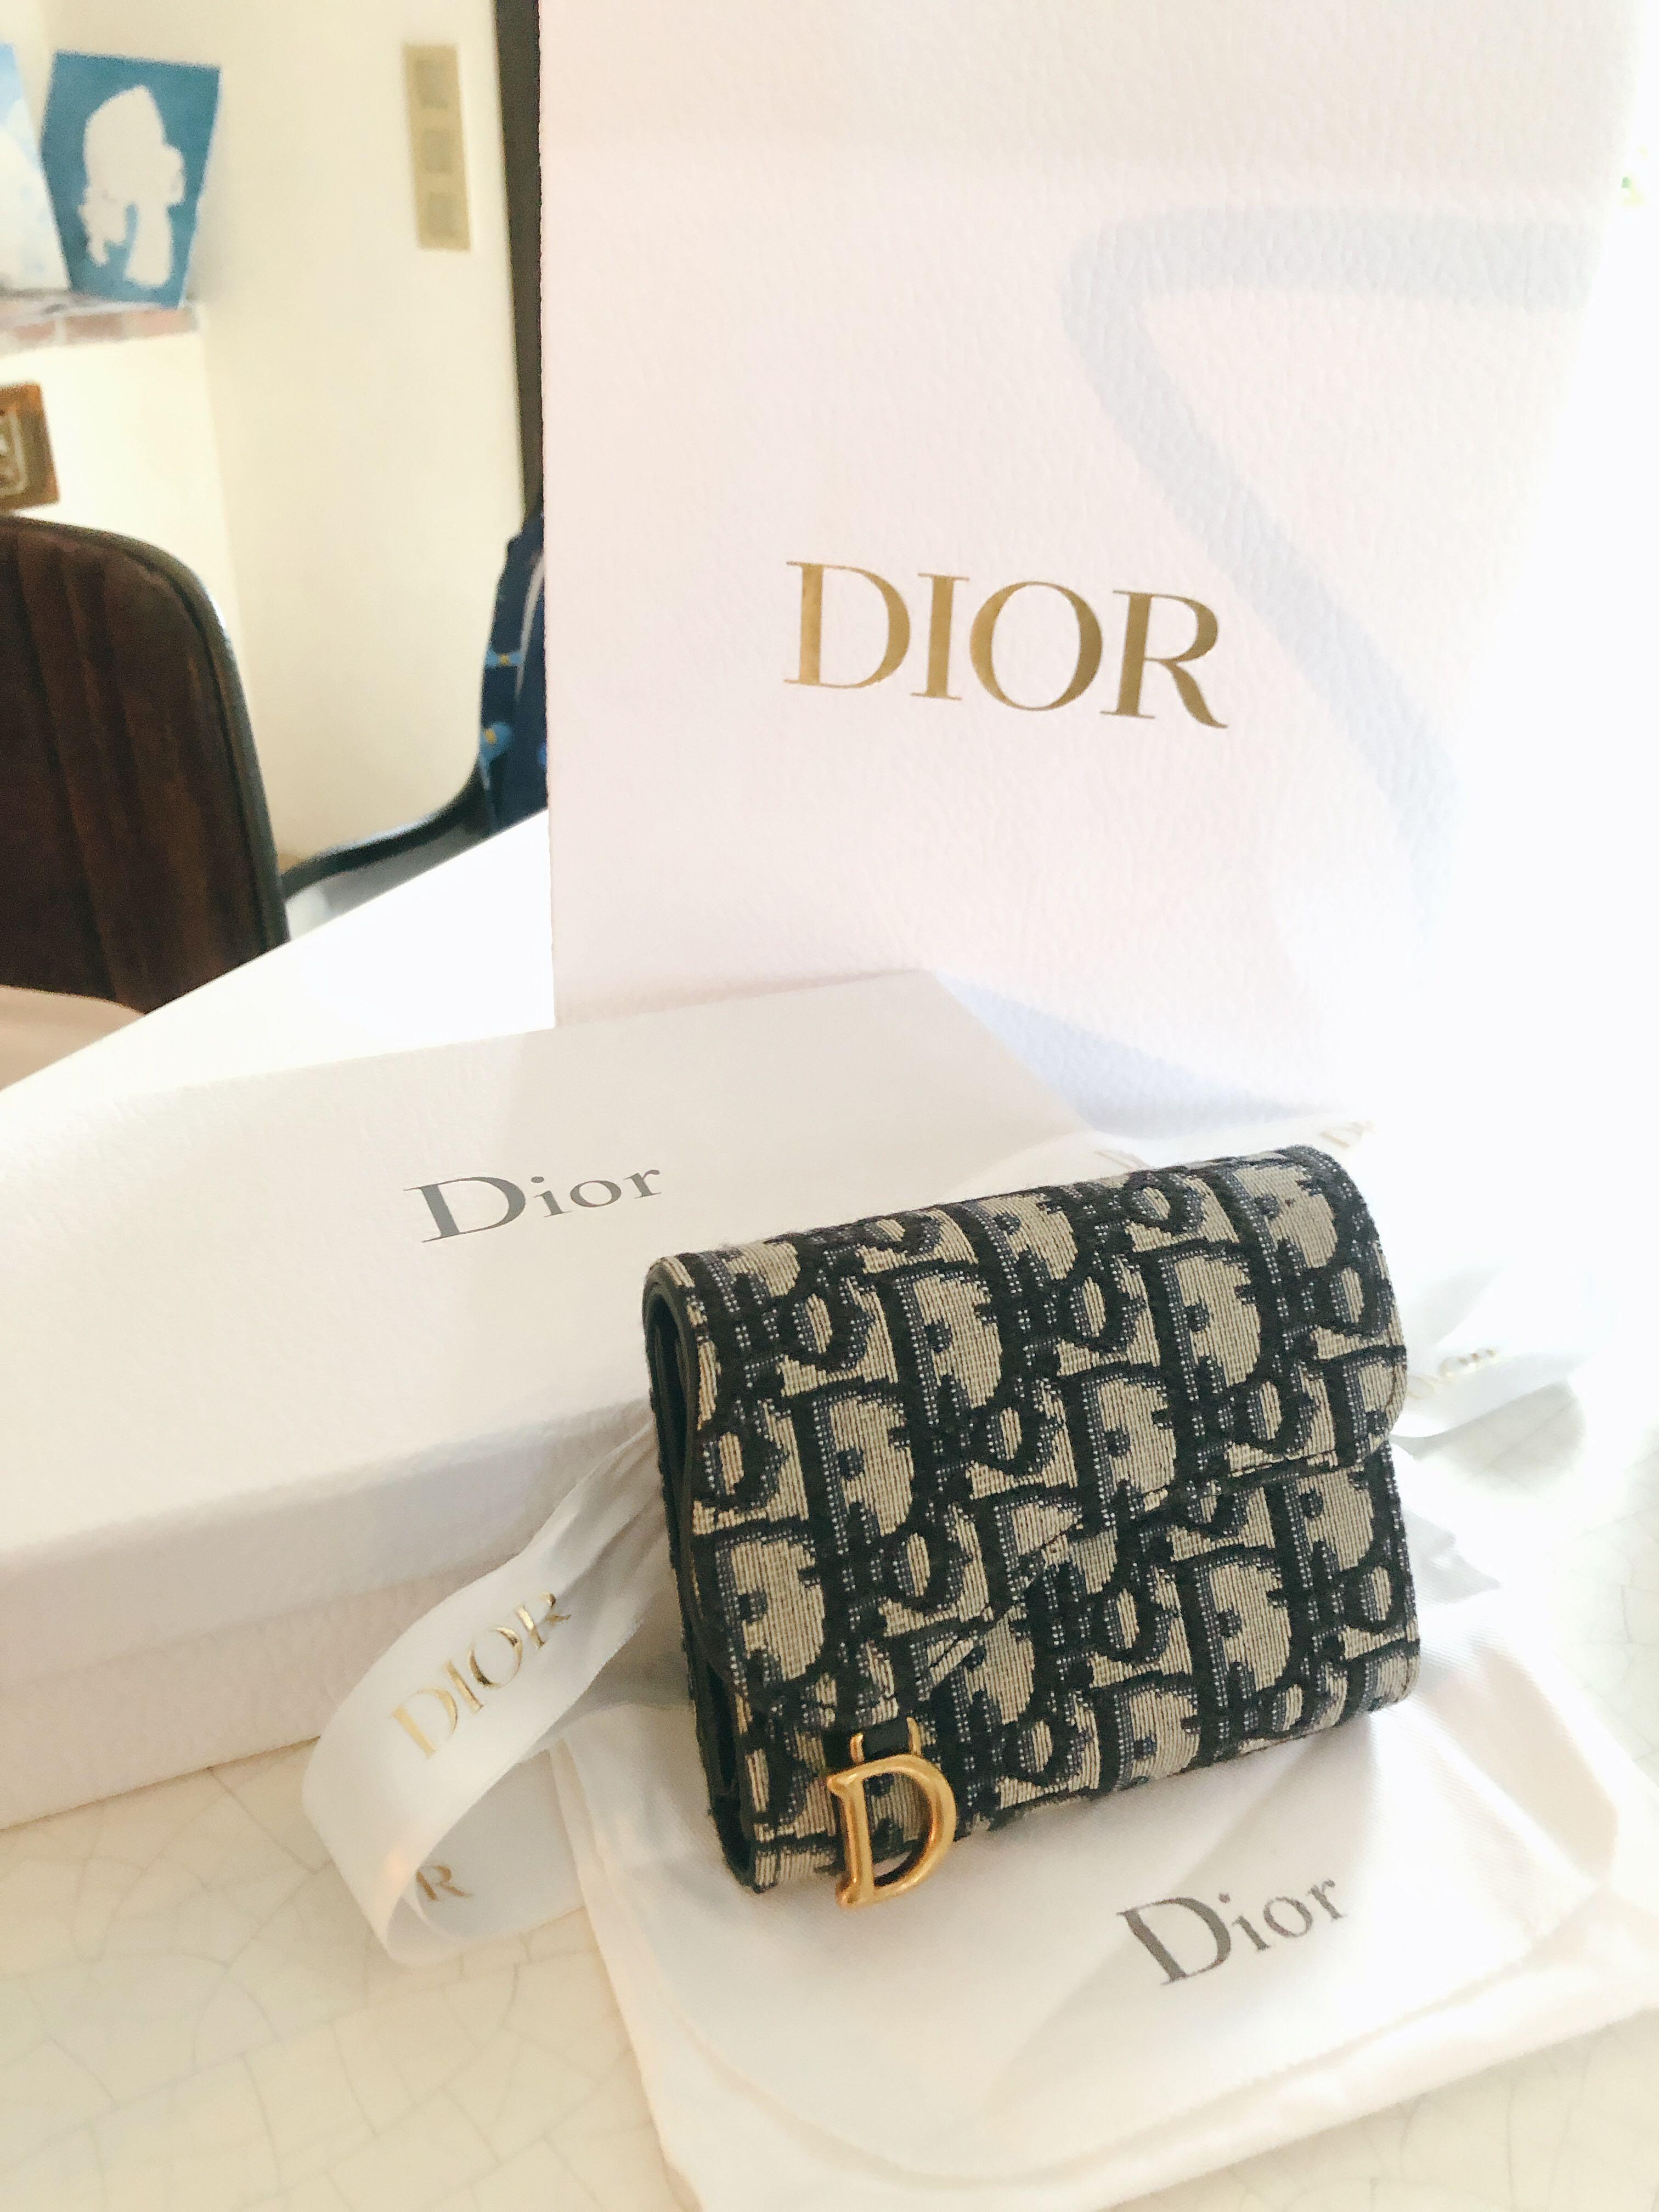 Dior Saddle Wallet Off 79 Www Amarkotarim Com Tr